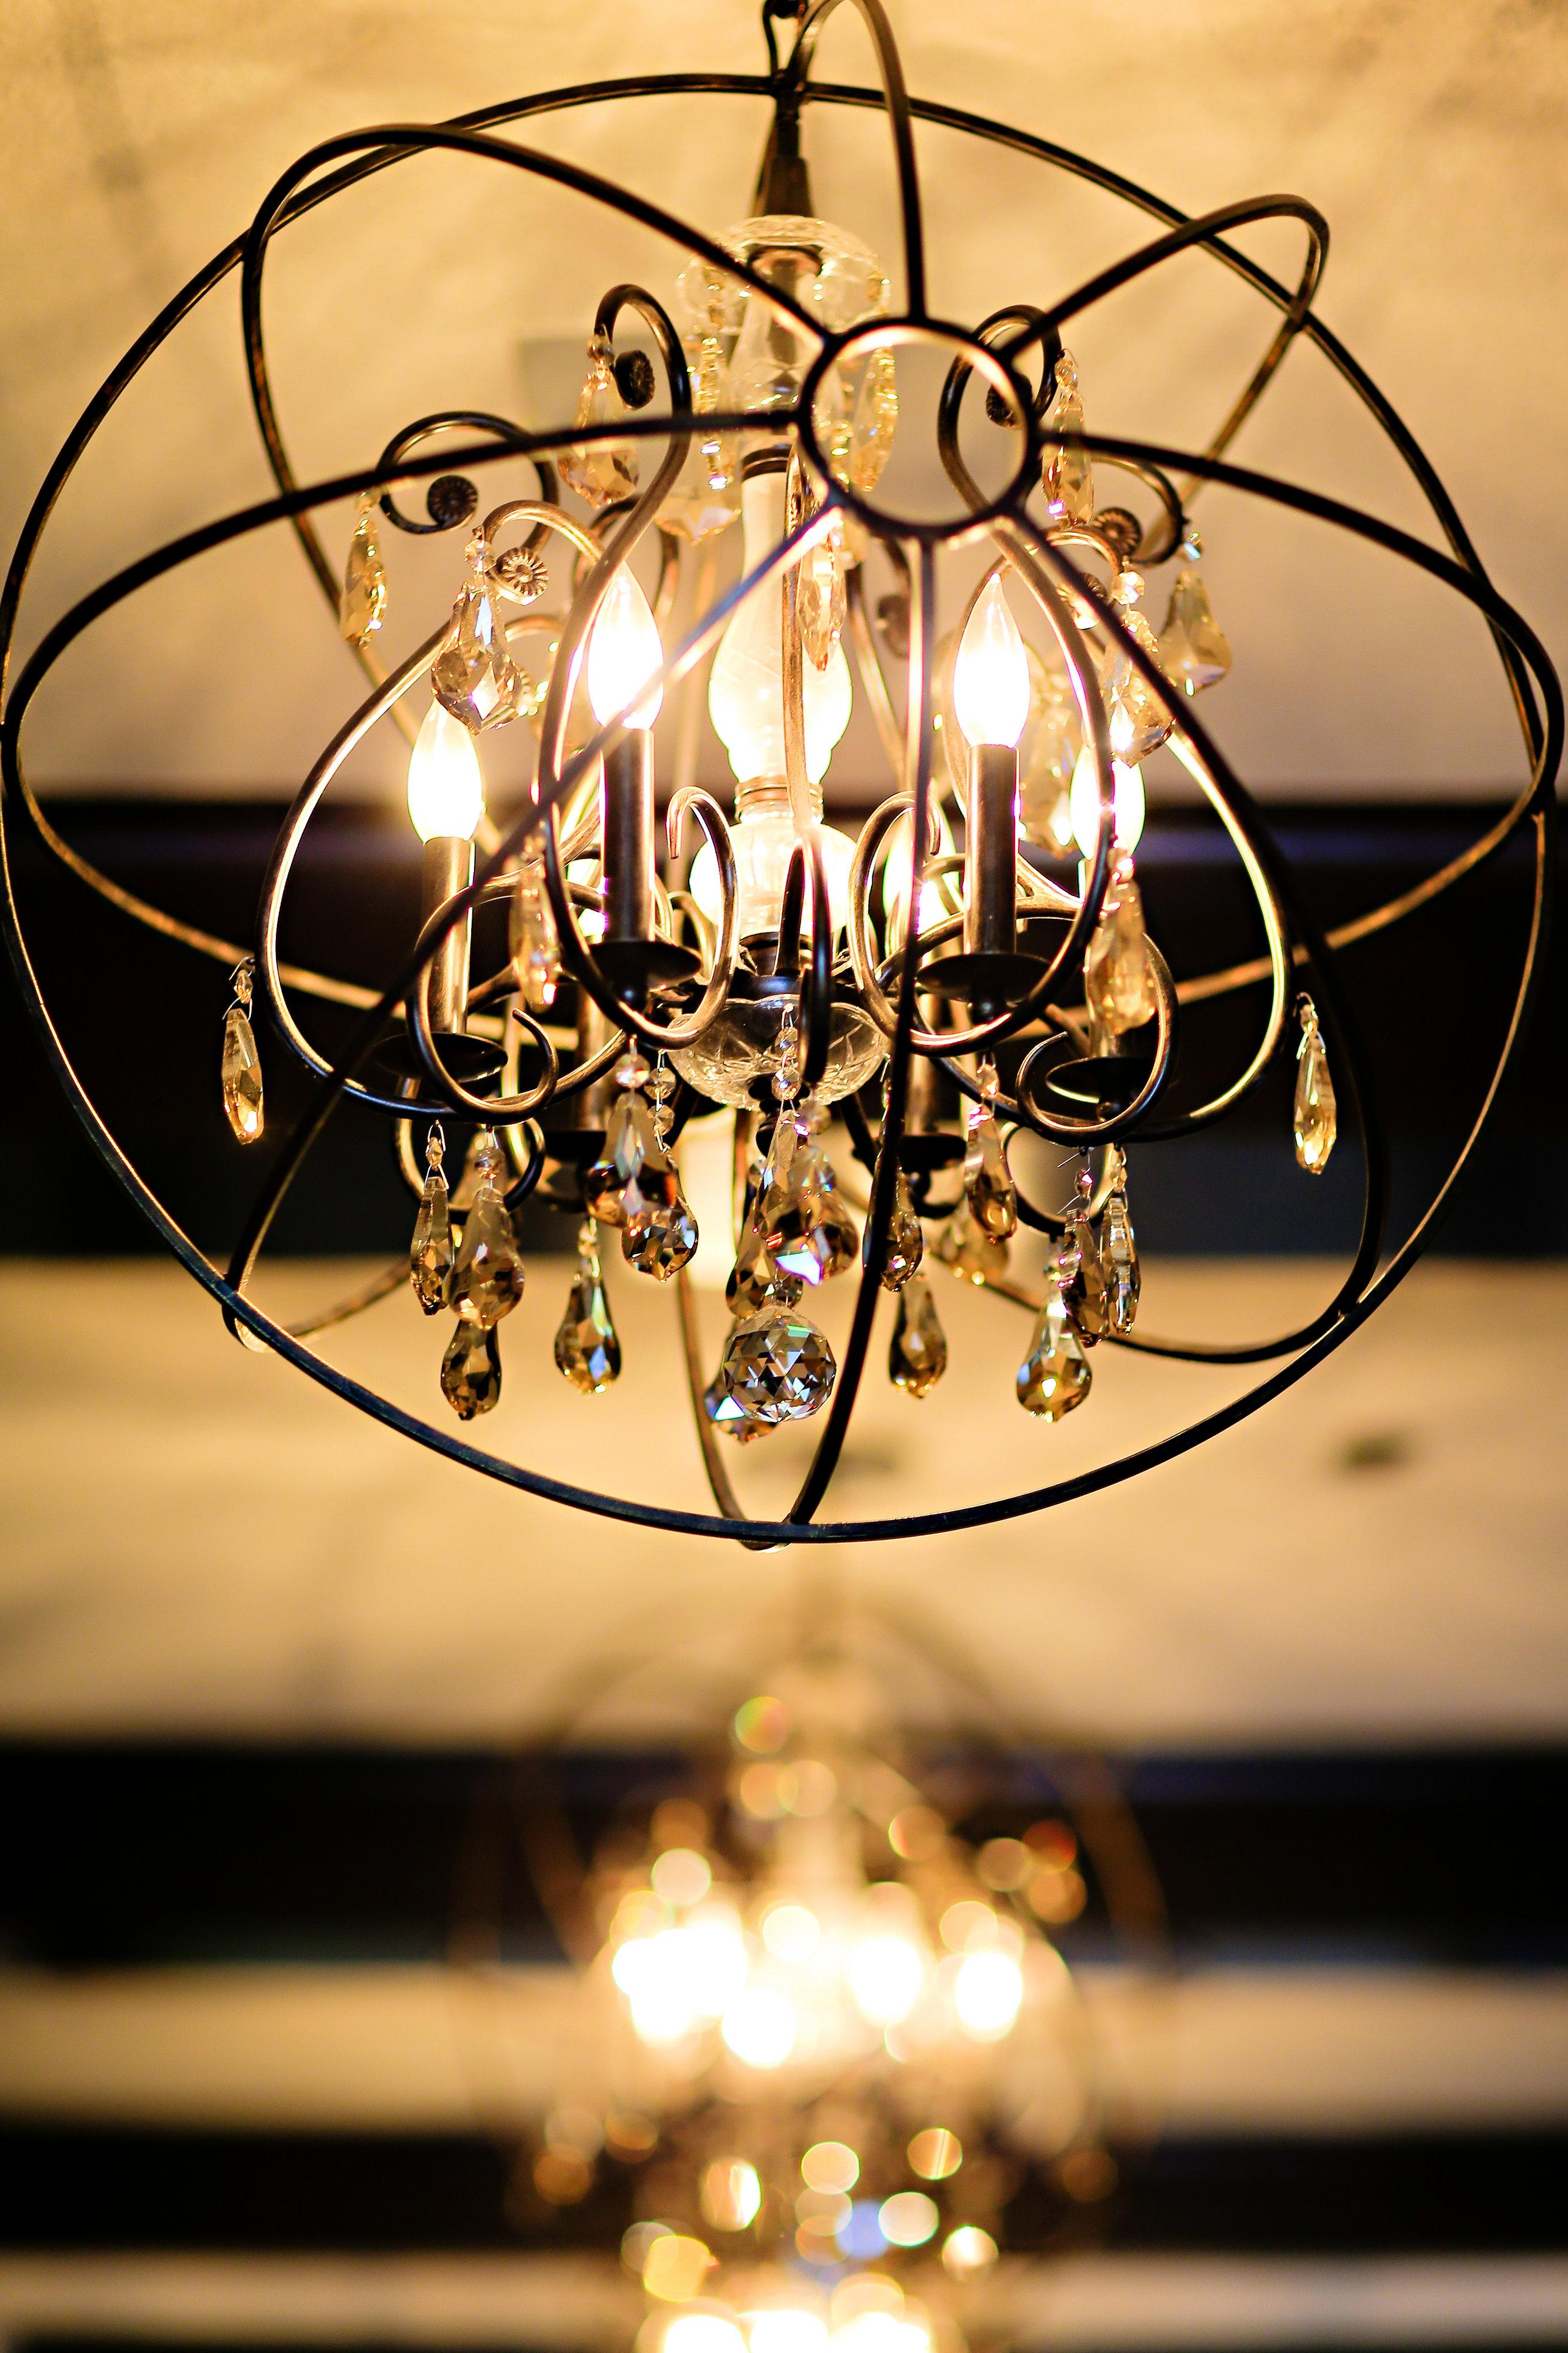 Empyrean Designs - Lighting